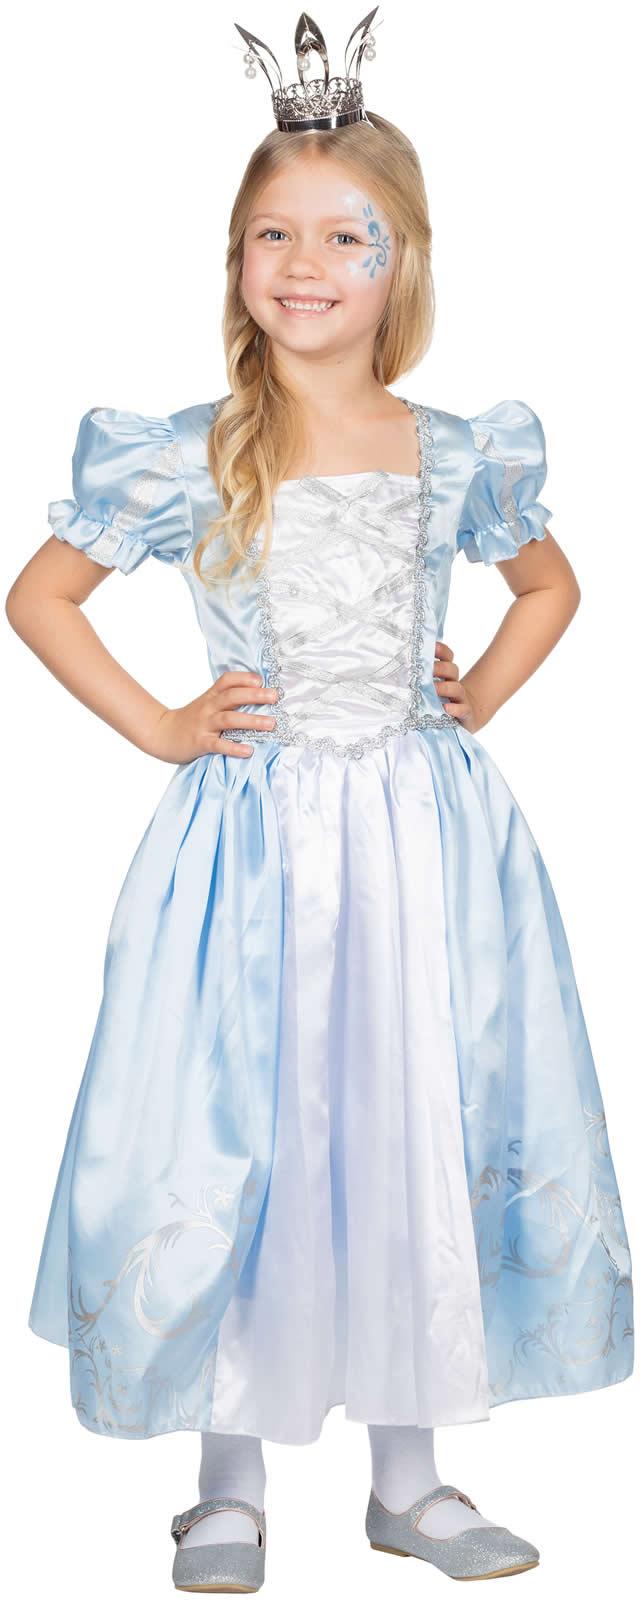 Prinzessin Lilly Kinder Karneval Fasching Kostum 104 128 Ebay